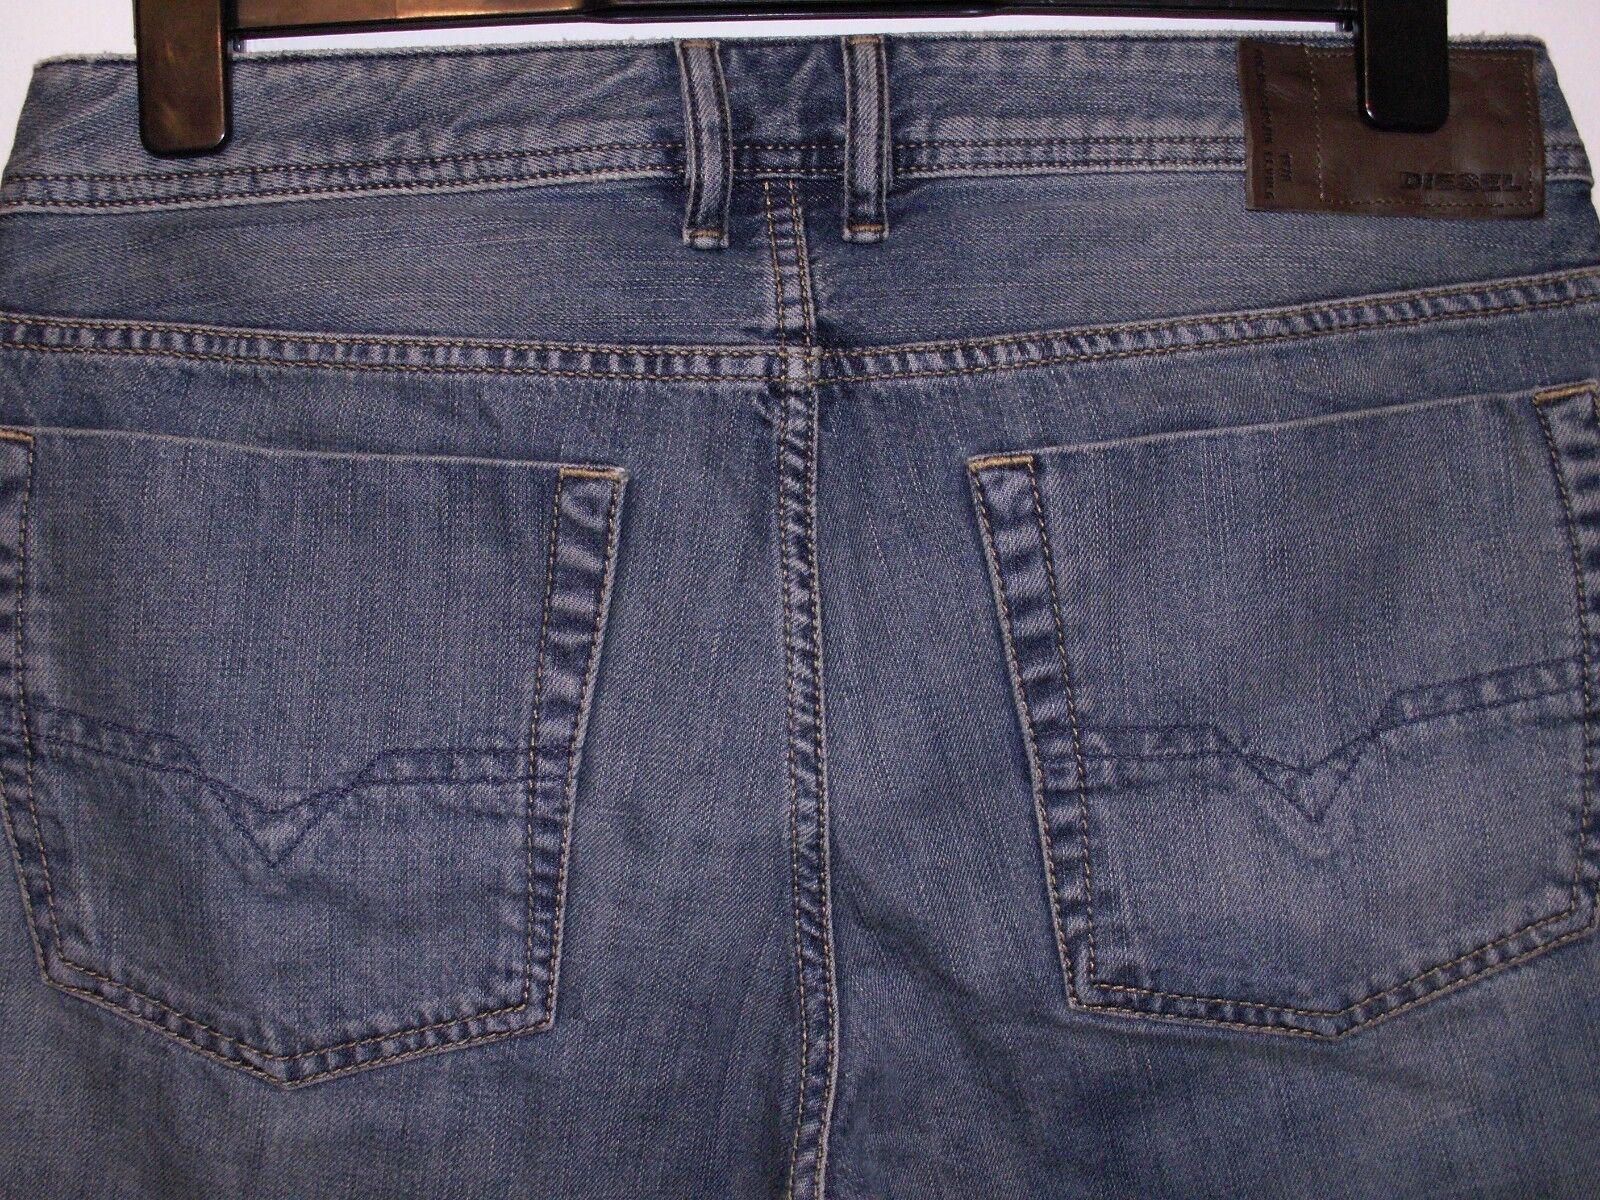 DIESEL ZATINY StiefelCUT JEANS 0R86S W32 L30 (3295)  sale